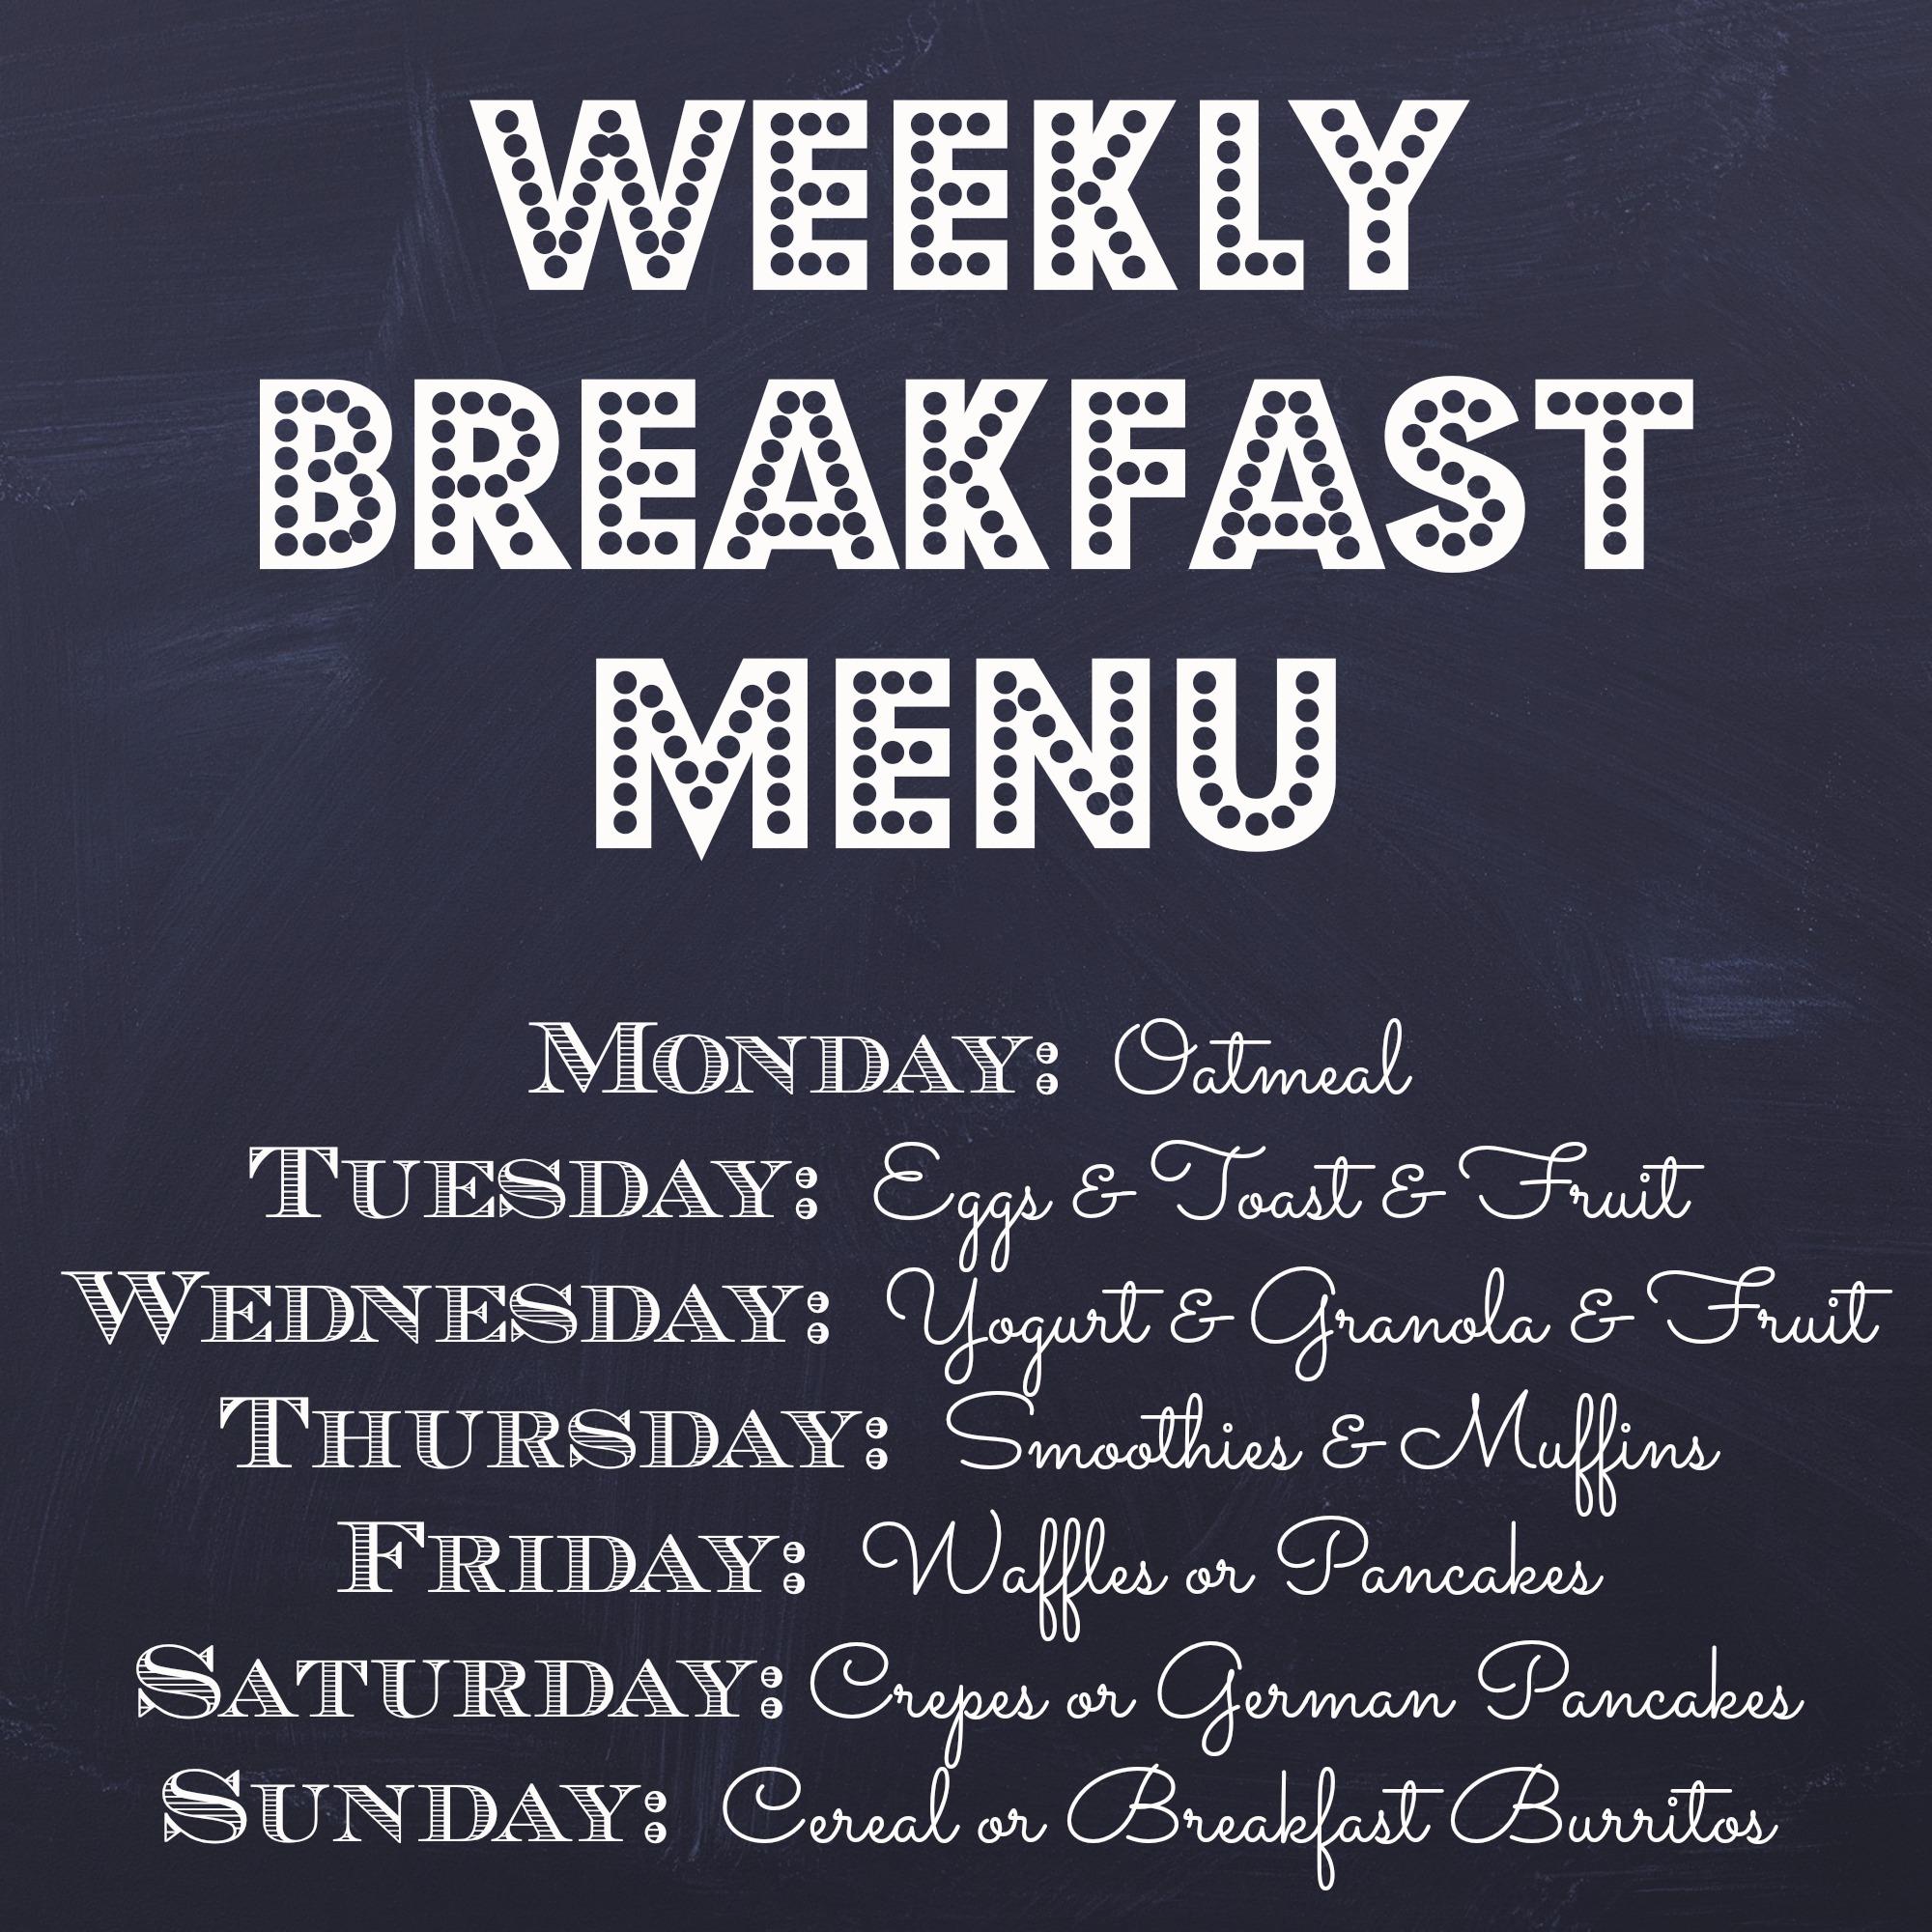 Dutch Baby Pancake Recipes : weekly breakfast meny